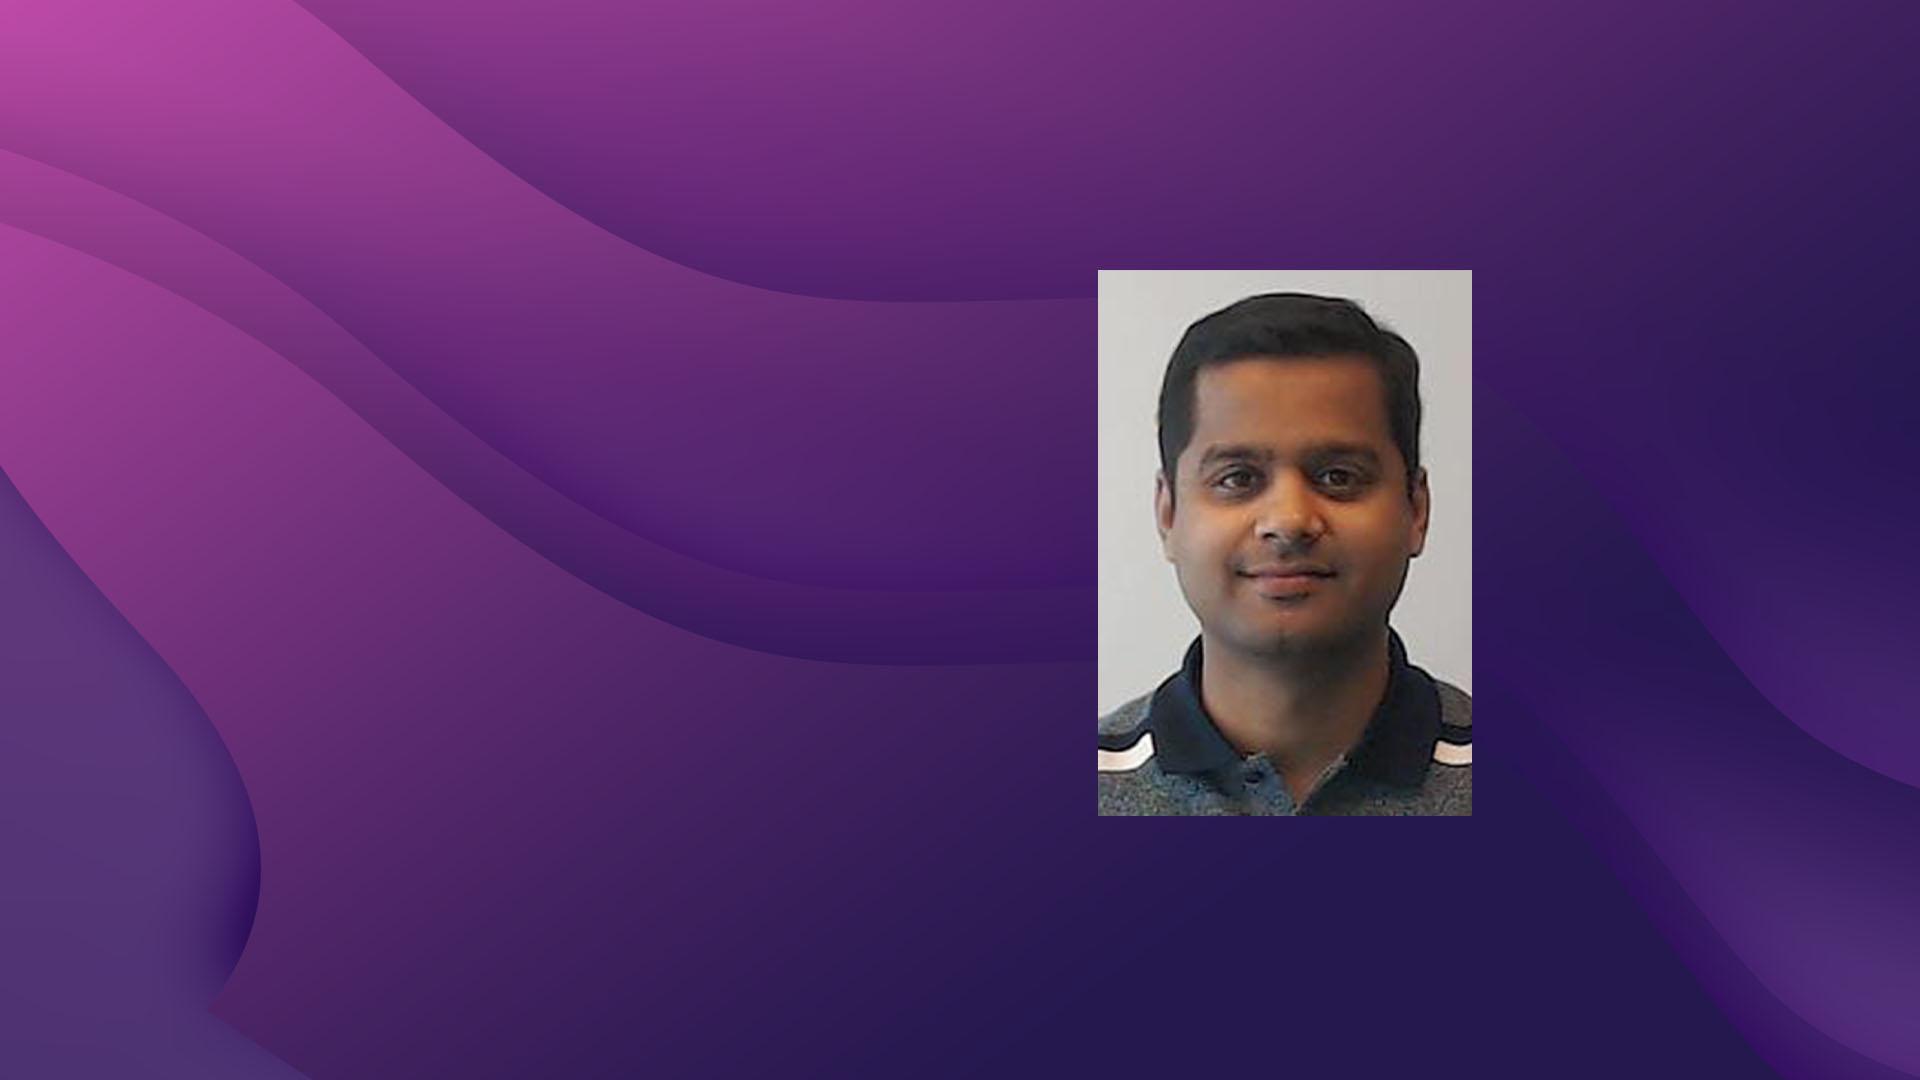 865: Arpan Sheth Shares His Inspiring Tech Career Story